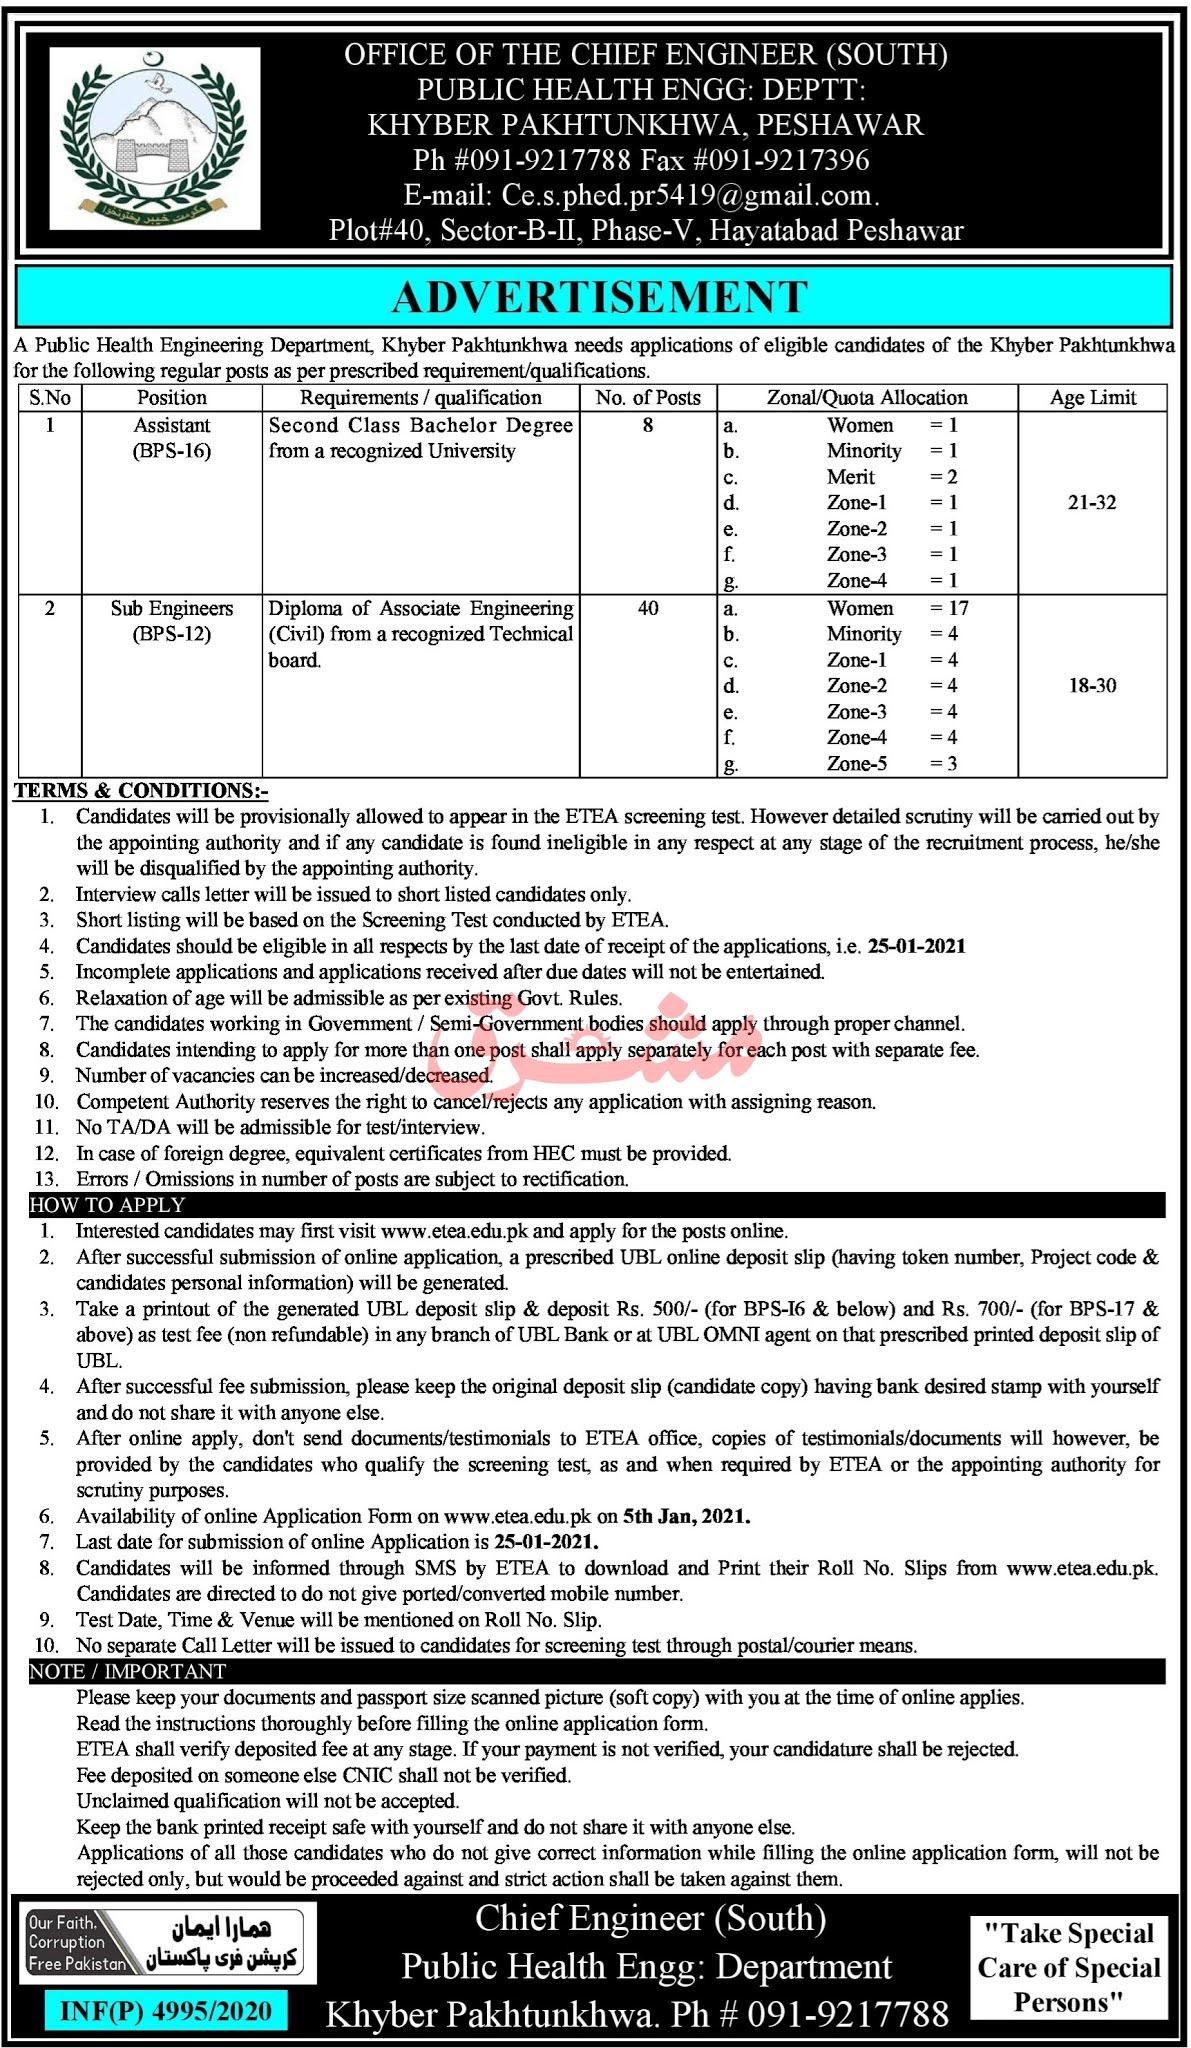 Health Department Jobs 2021 - Public Health Engineering Department Jobs 2021 - Download Job Application Form - www.etea.edu.pk